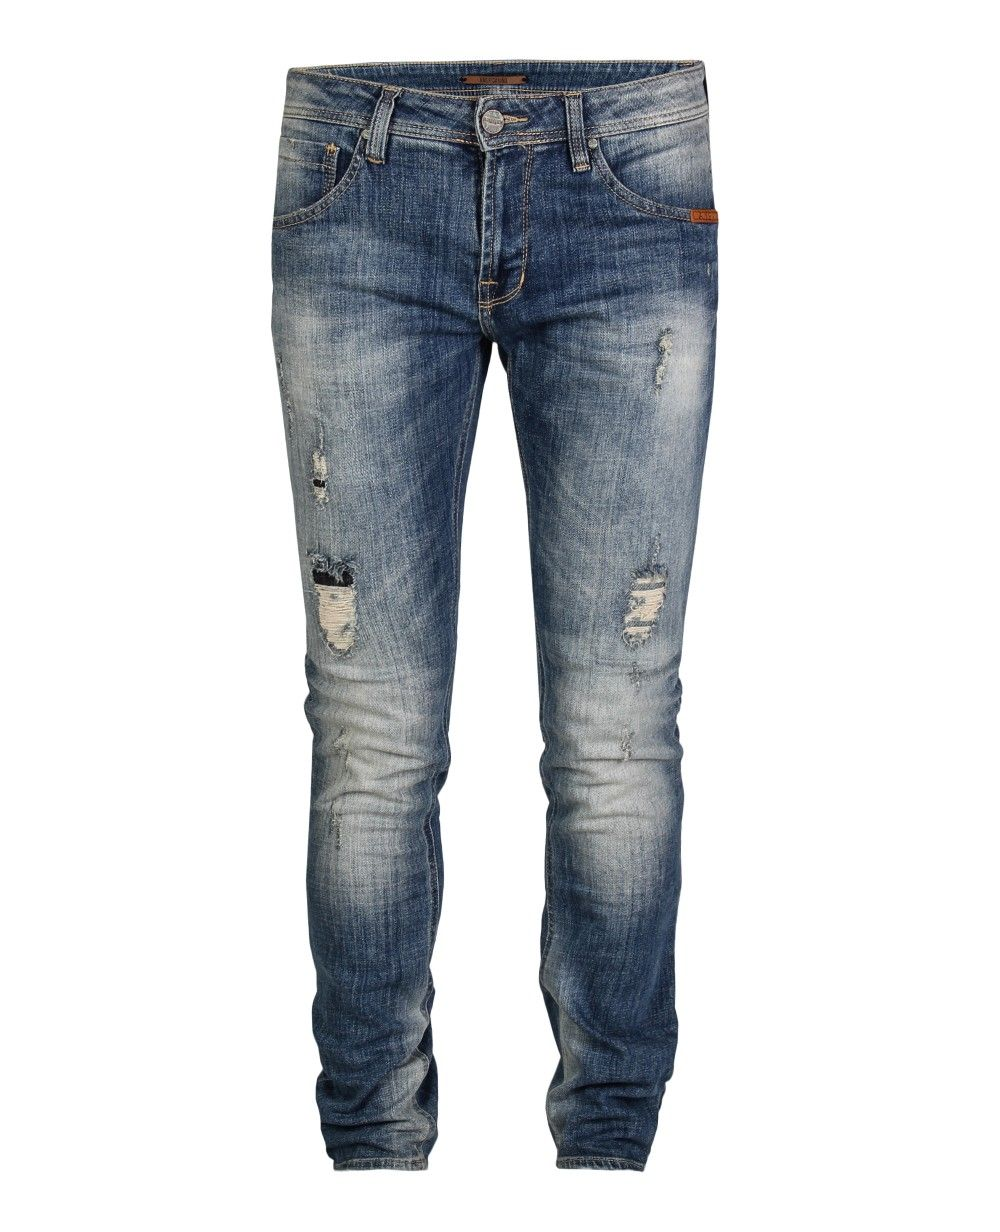 Jean 5336703 - americanino | PROCESOS | Pinterest | Jeans, Moda ...